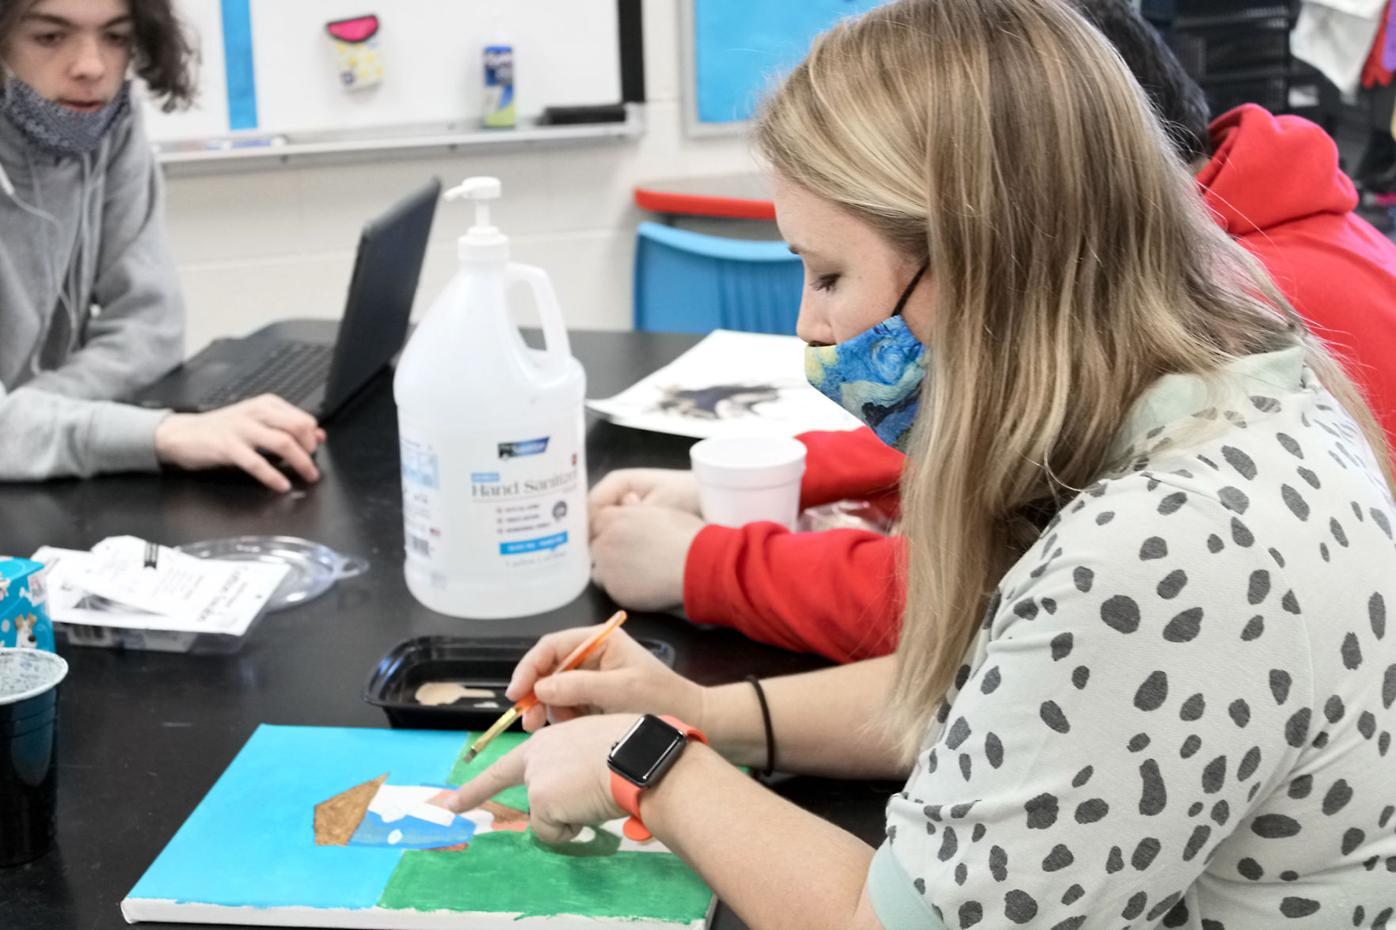 Raquel Roy teaches art at Maryville High School